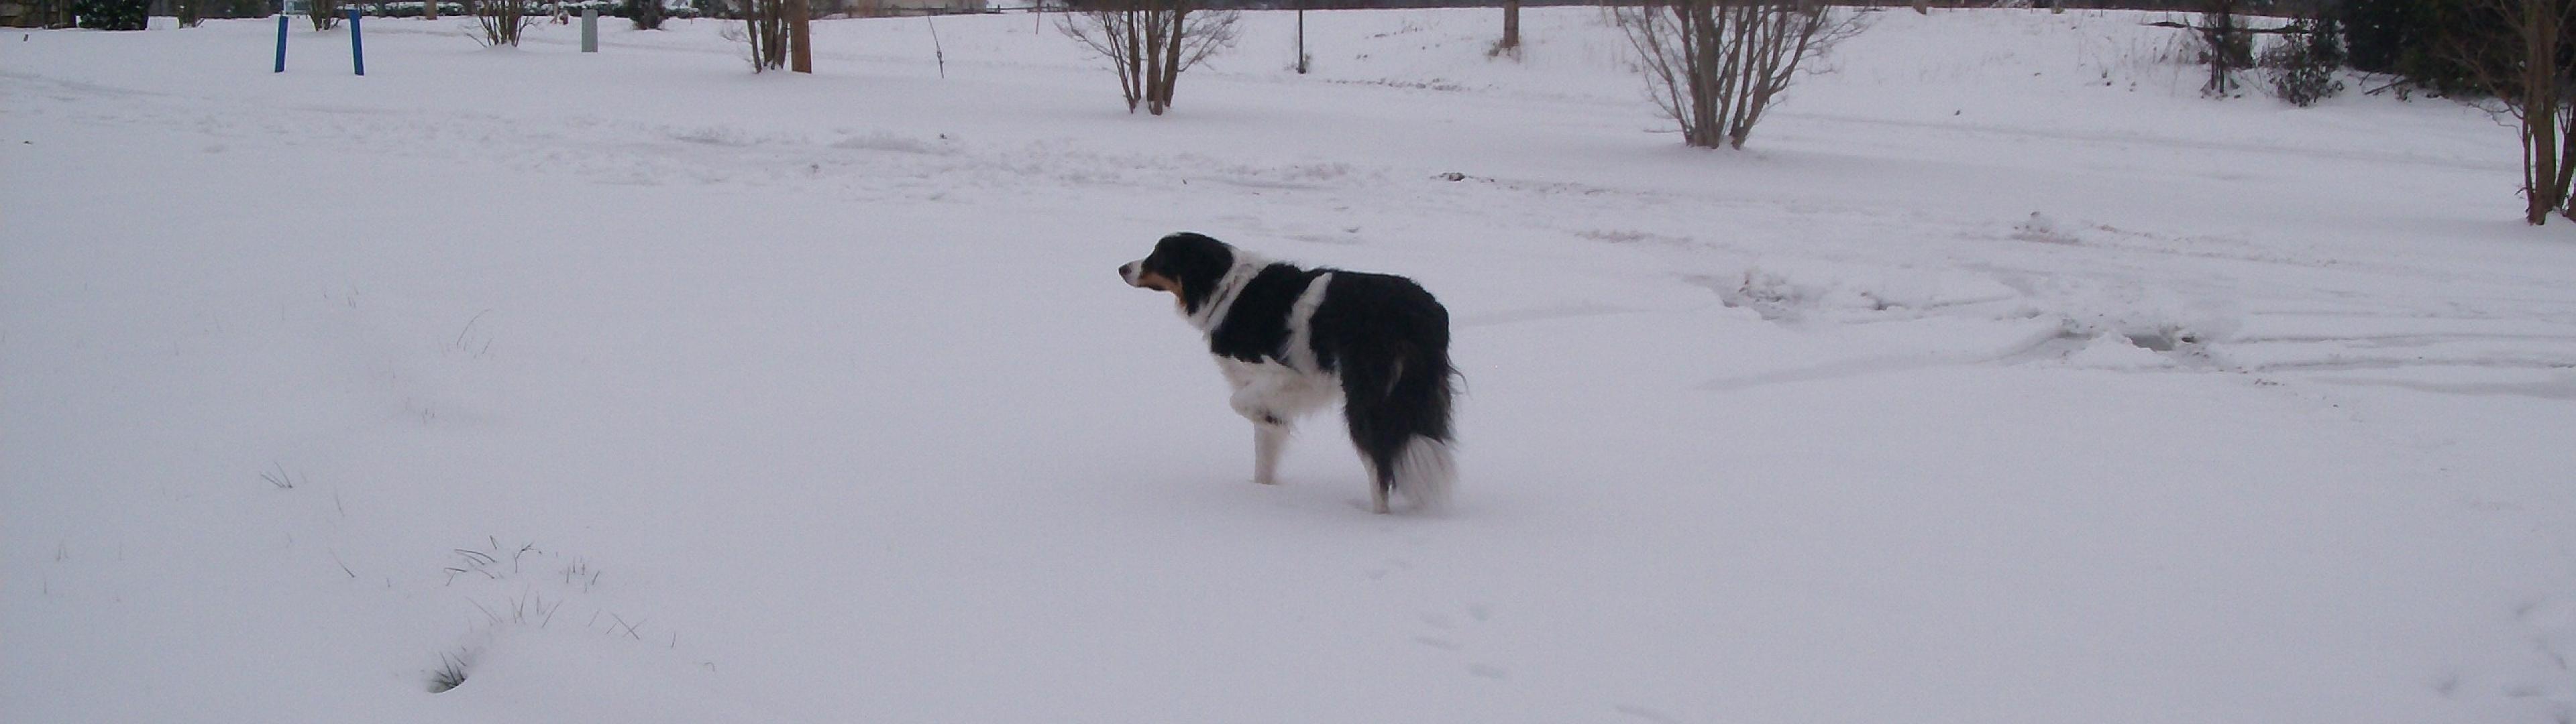 winter_animals_dogs_desktop_2560x1920_hd-wallpaper-1253847.jpg